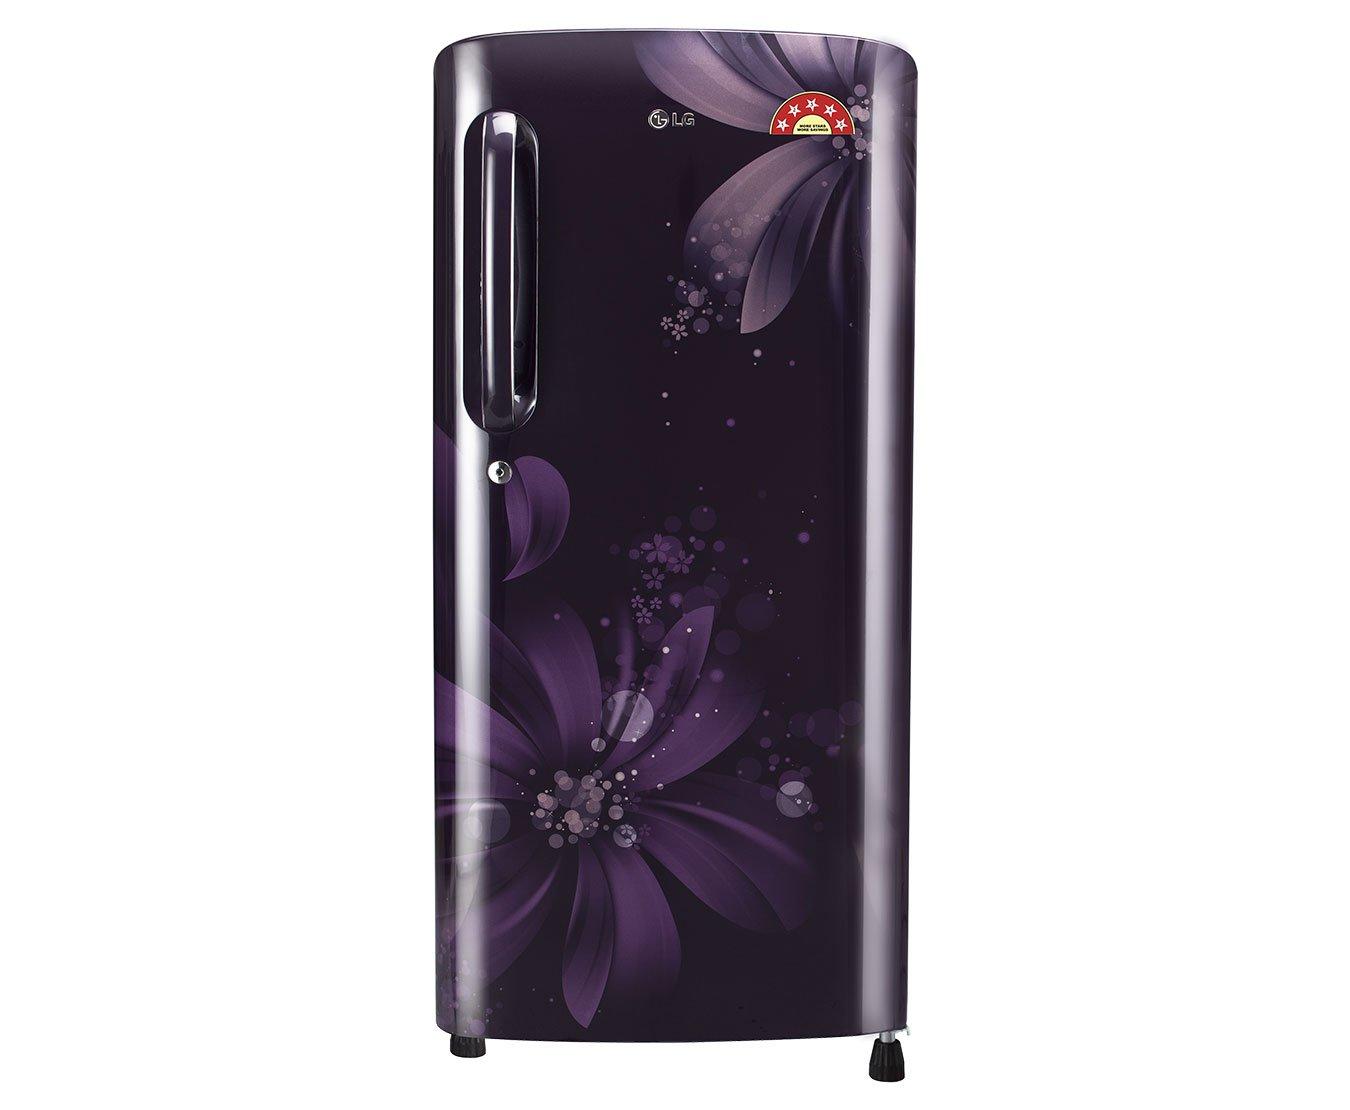 refrigerator amazon. lg 190 l 5 star direct-cool single door refrigerator (gl-b201apan.apazebn, purple aster): amazon.in: home \u0026 kitchen amazon